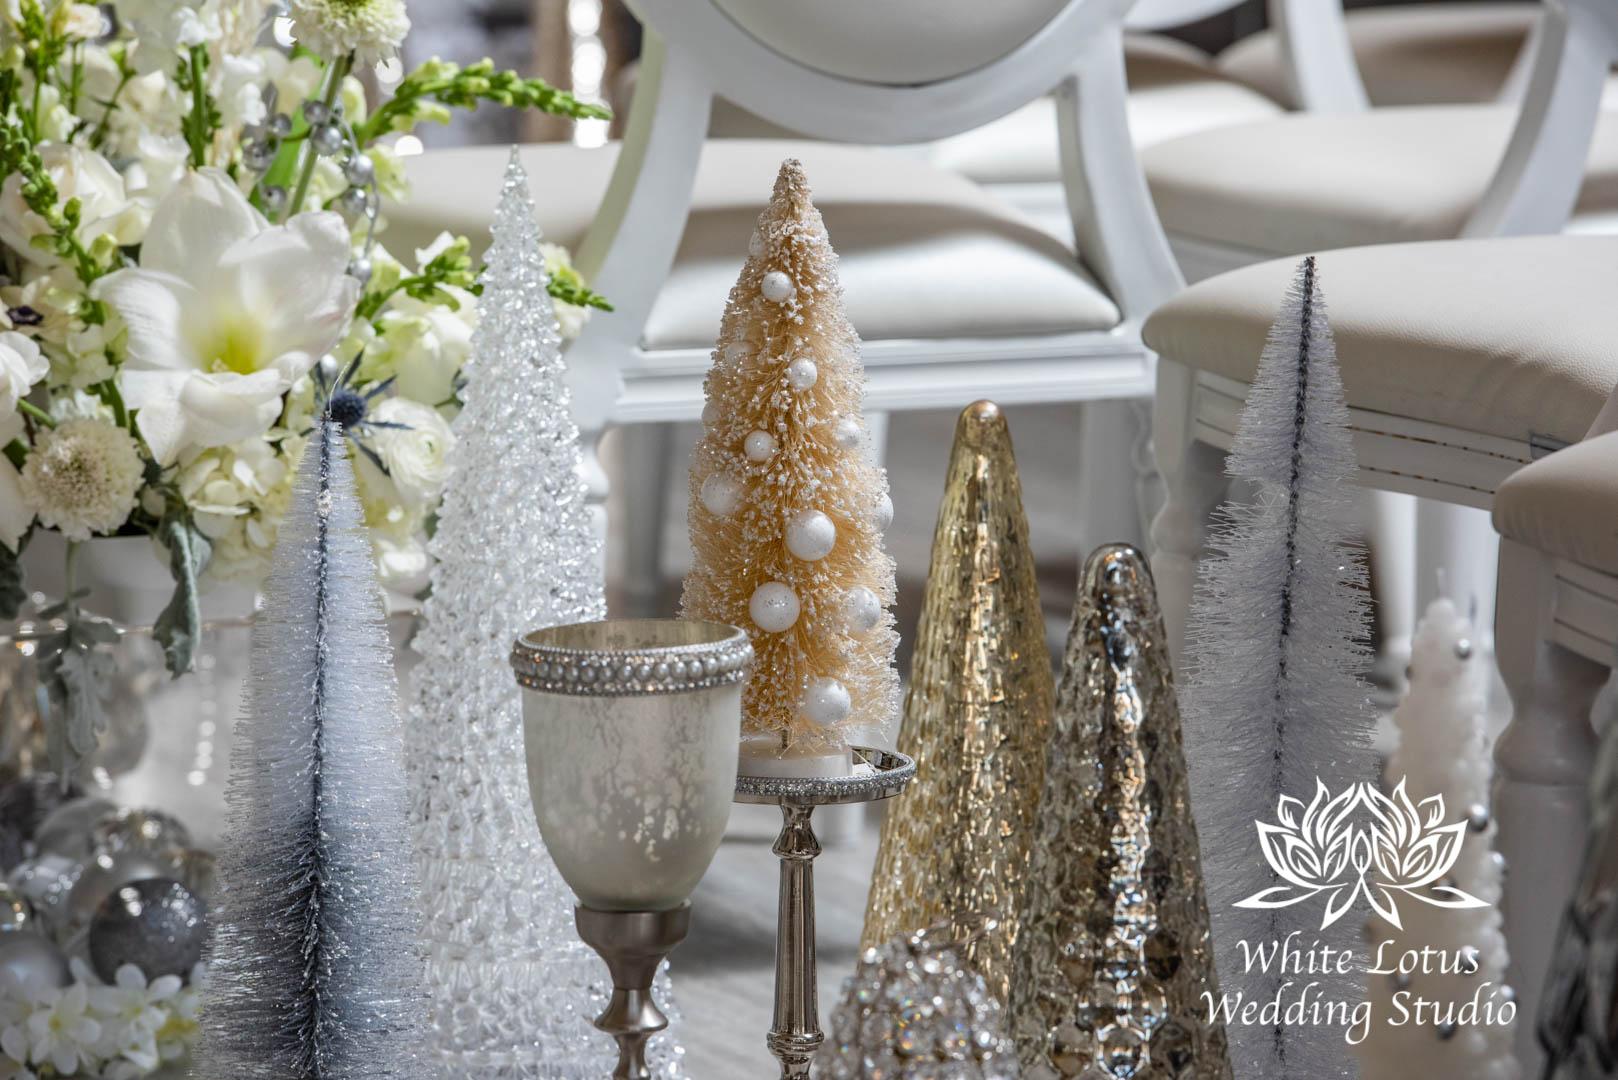 029- GLAM WINTERLUXE WEDDING INSPIRATION